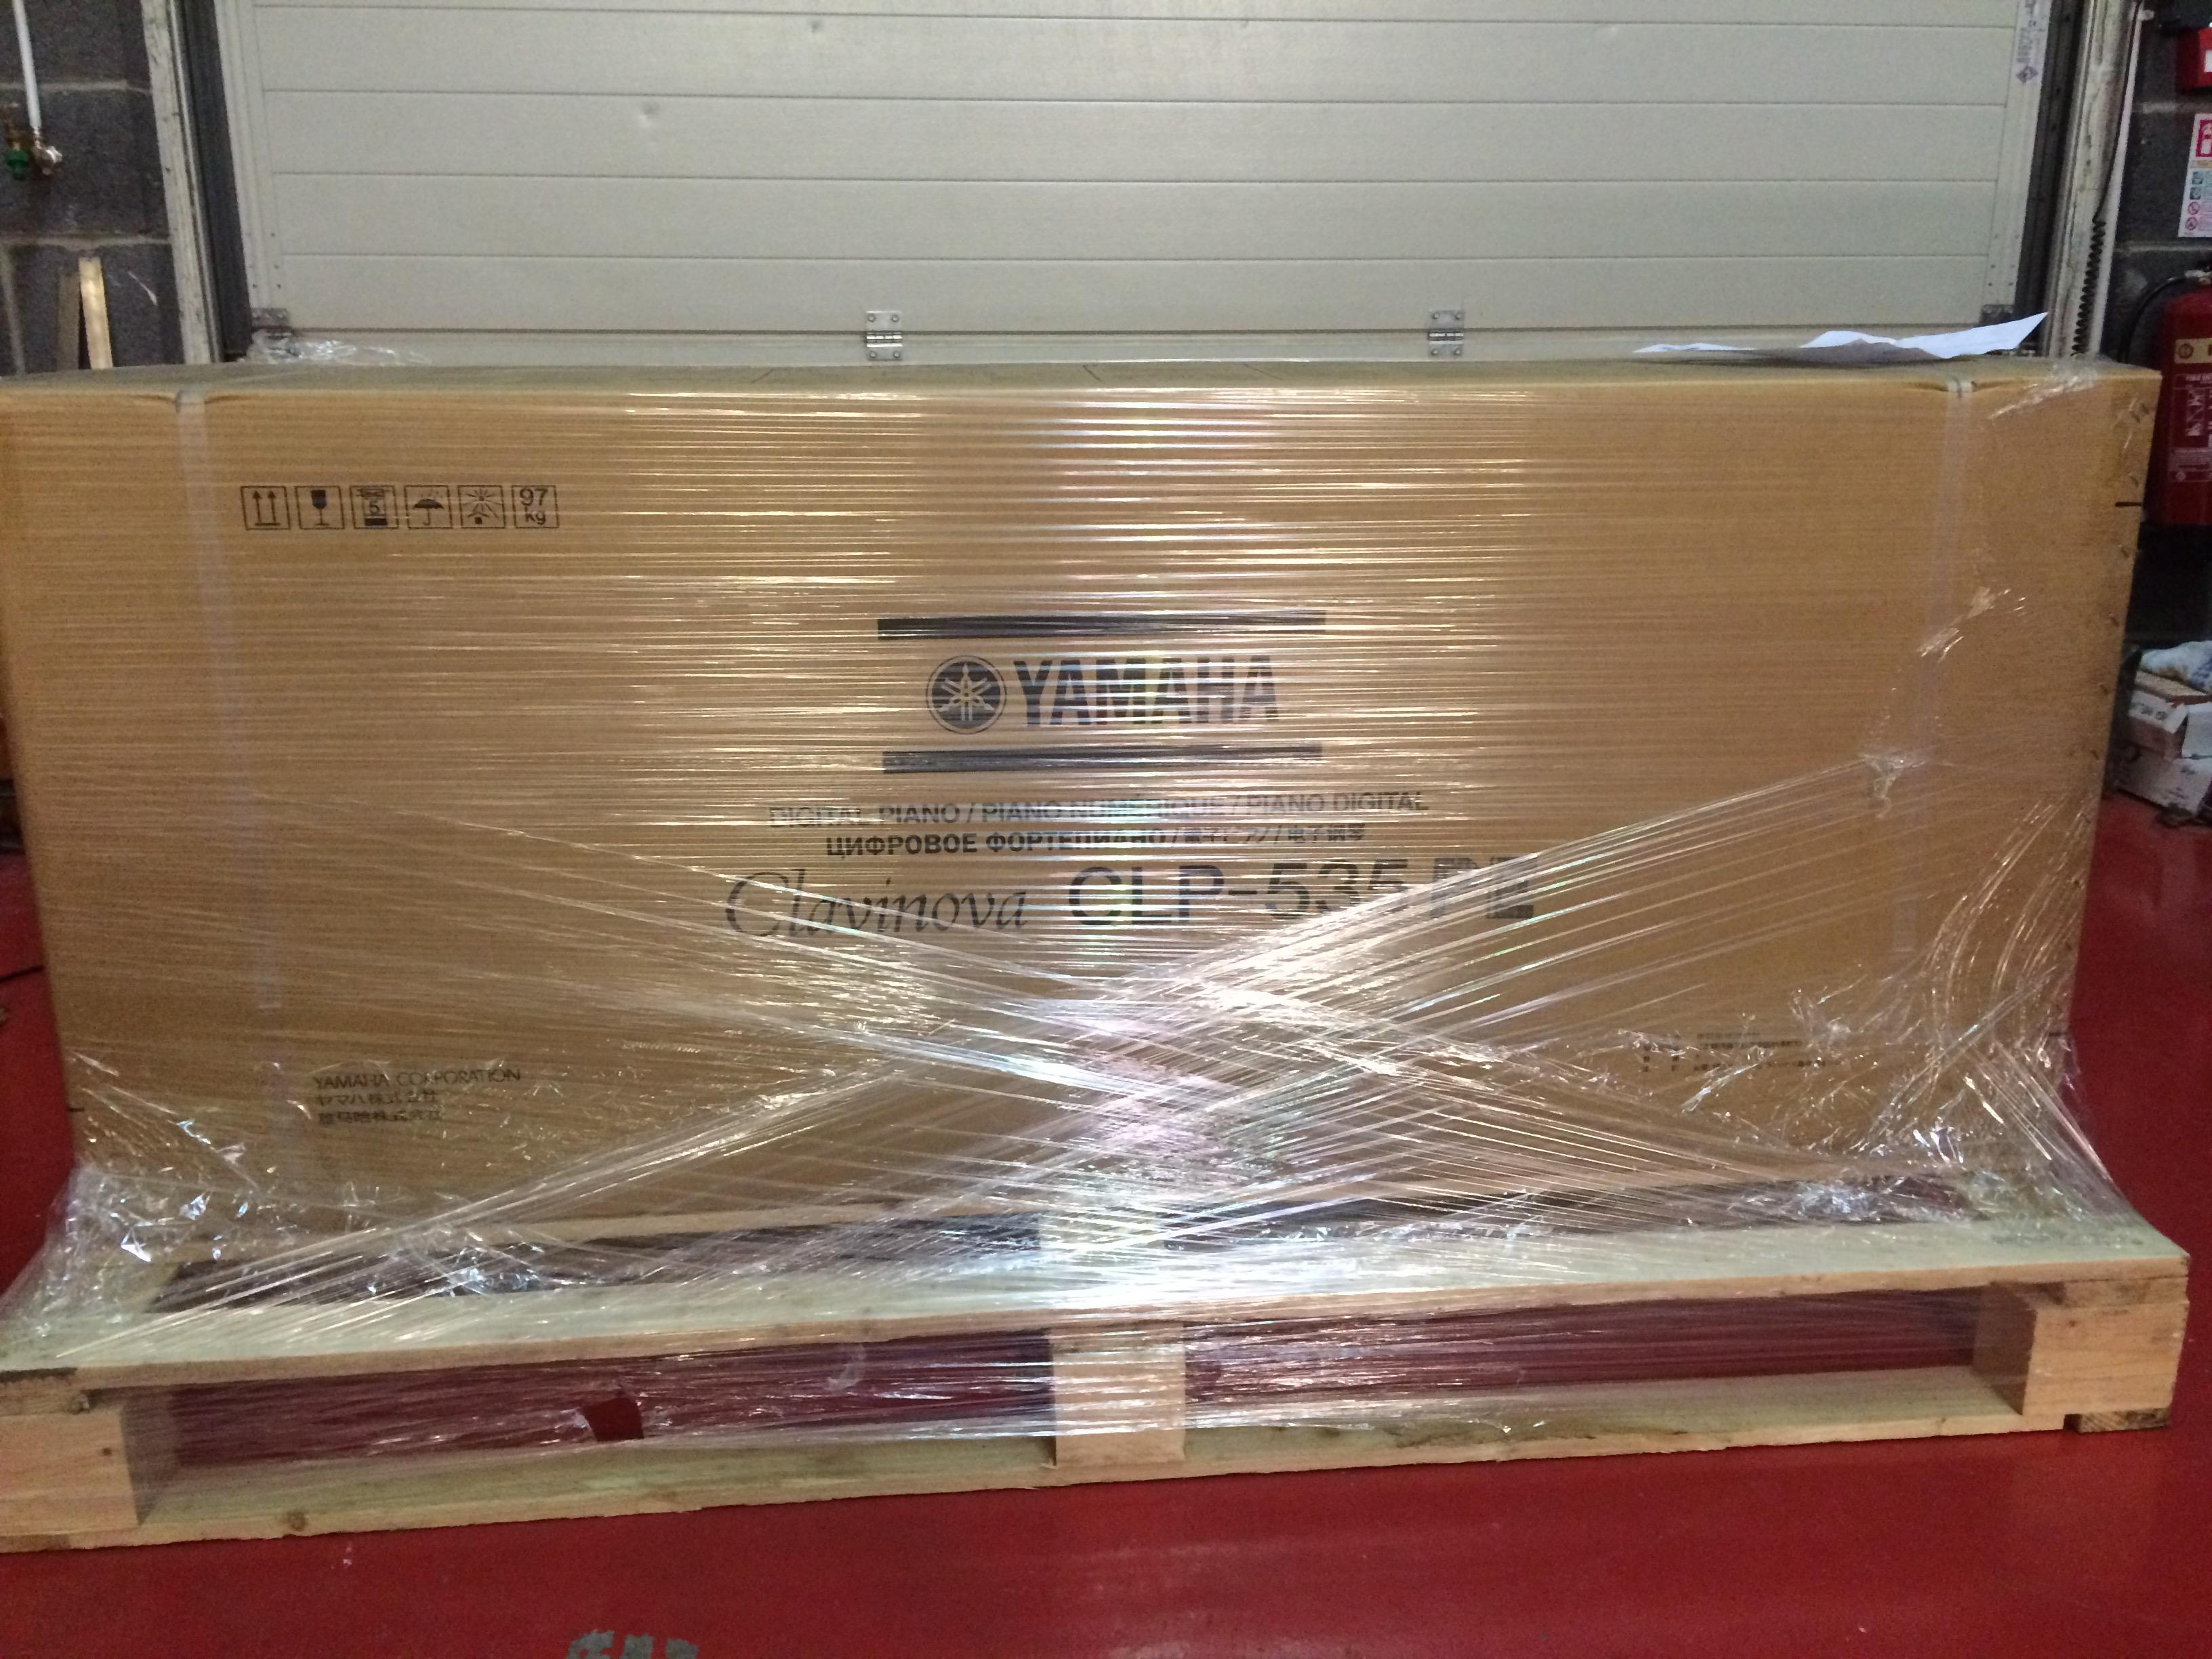 Showroom thornton pianos irelandthornton pianos ireland for Yamaha clavinova clp 535 for sale